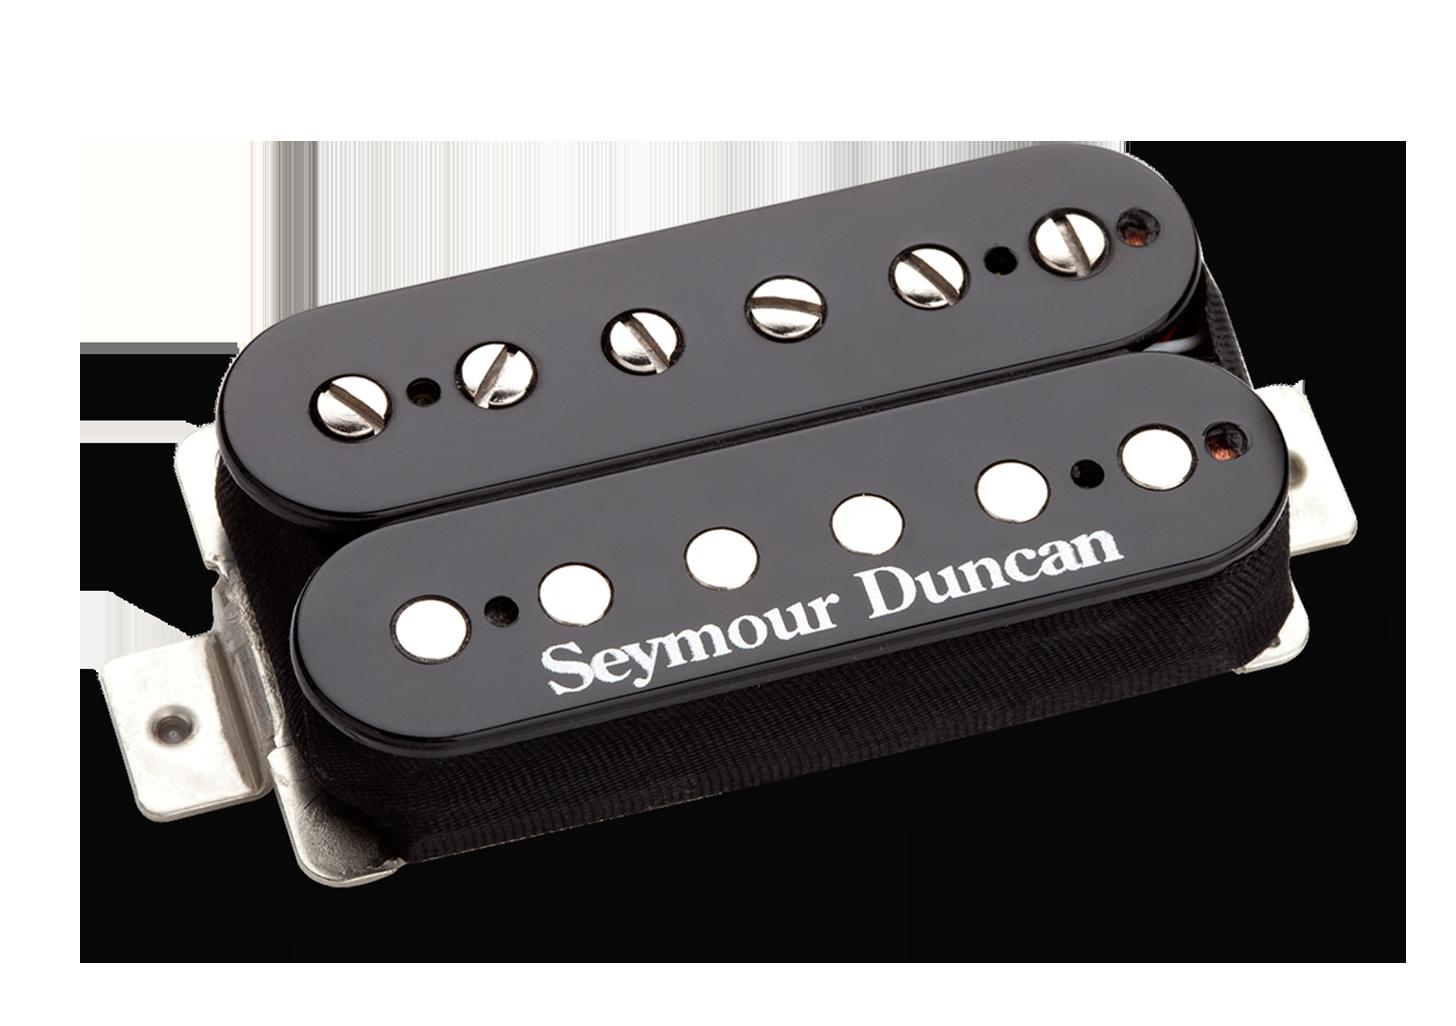 Seymour Duncan Pearly Gates Humbucker - SH-PG1N Neck Black